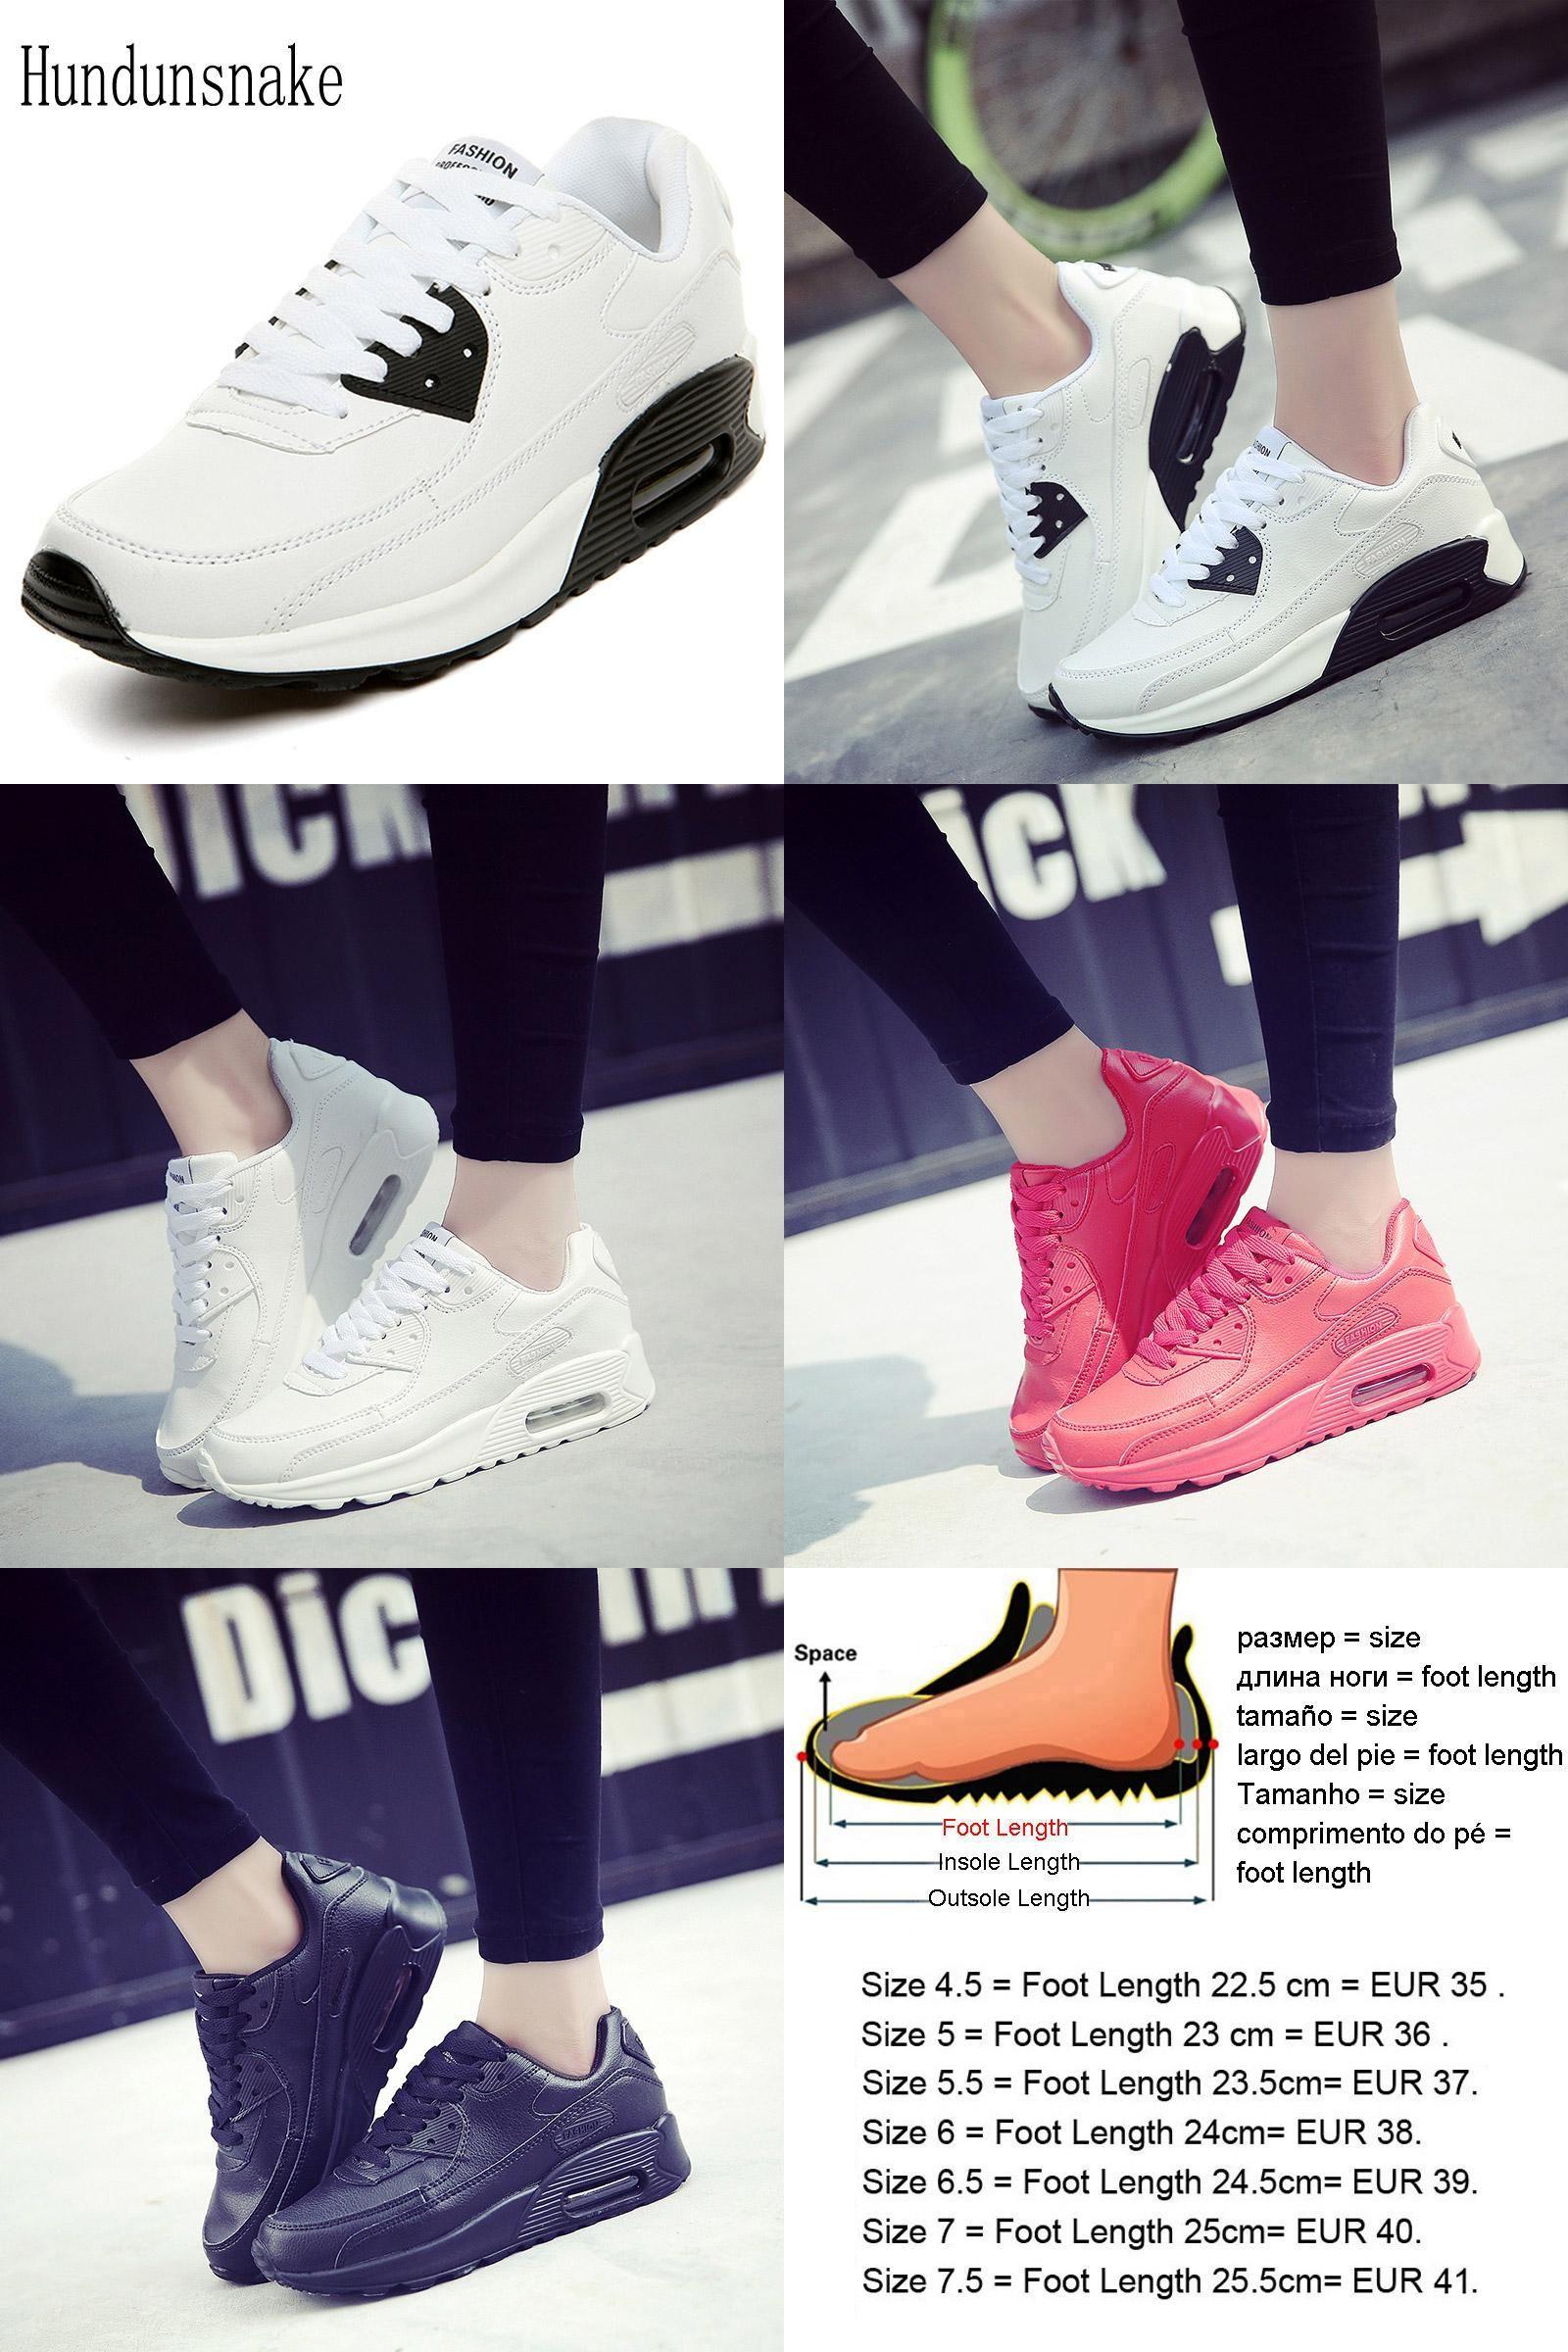 ffa54455e31 [Visit to Buy] Hundunsnake White Leather Women Sneakers Ladies Sport Shoes  Running Cheap Cushion